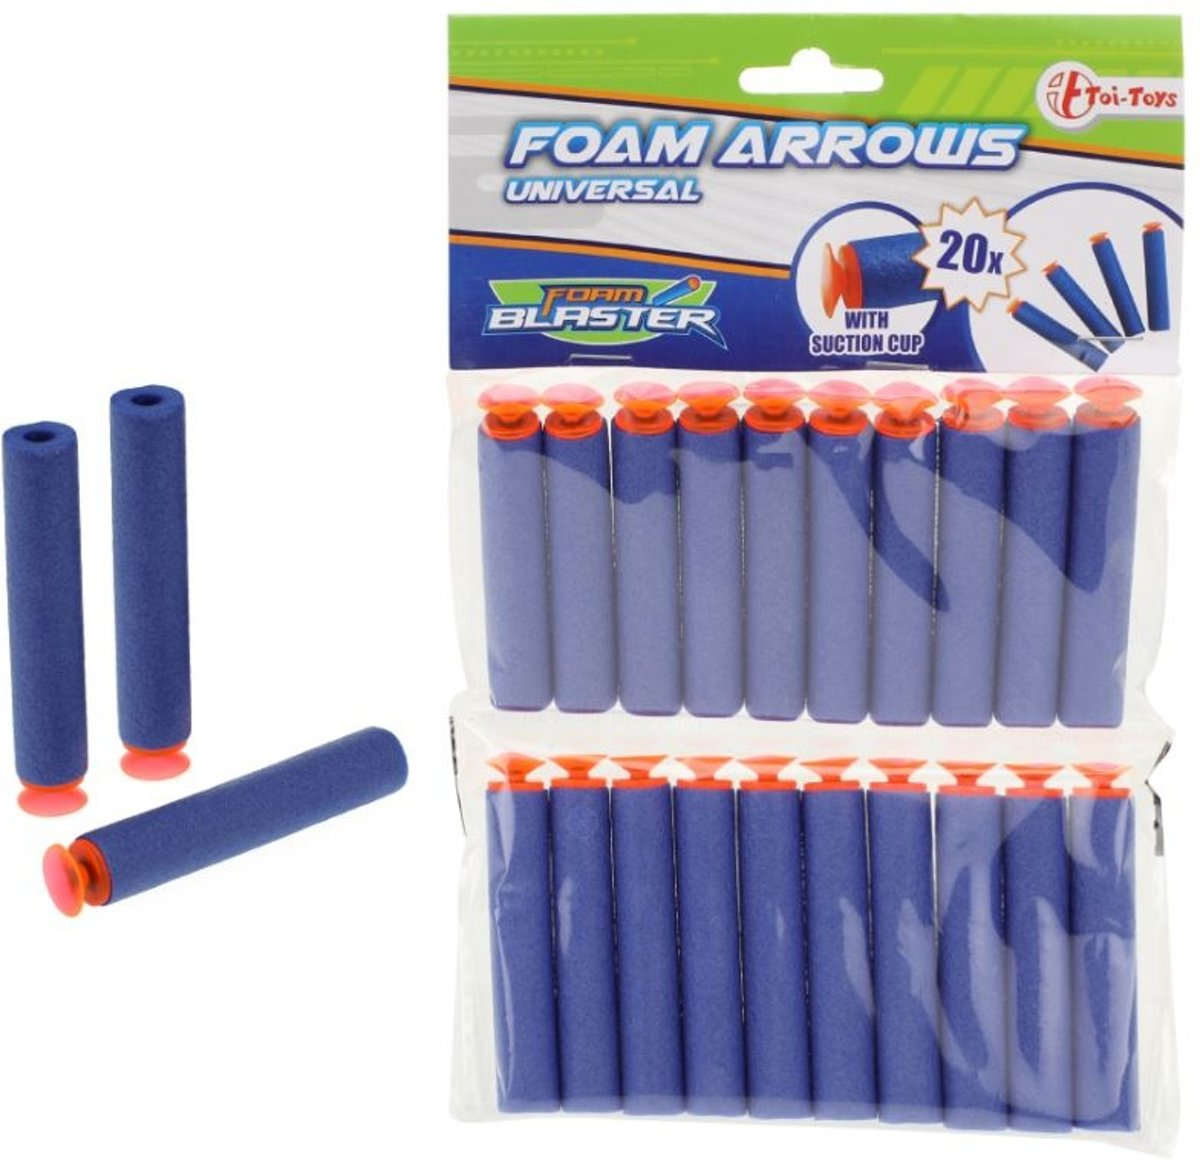 Toi-toys Navulset Foam Blaster Met Zuignap 20 Stuks